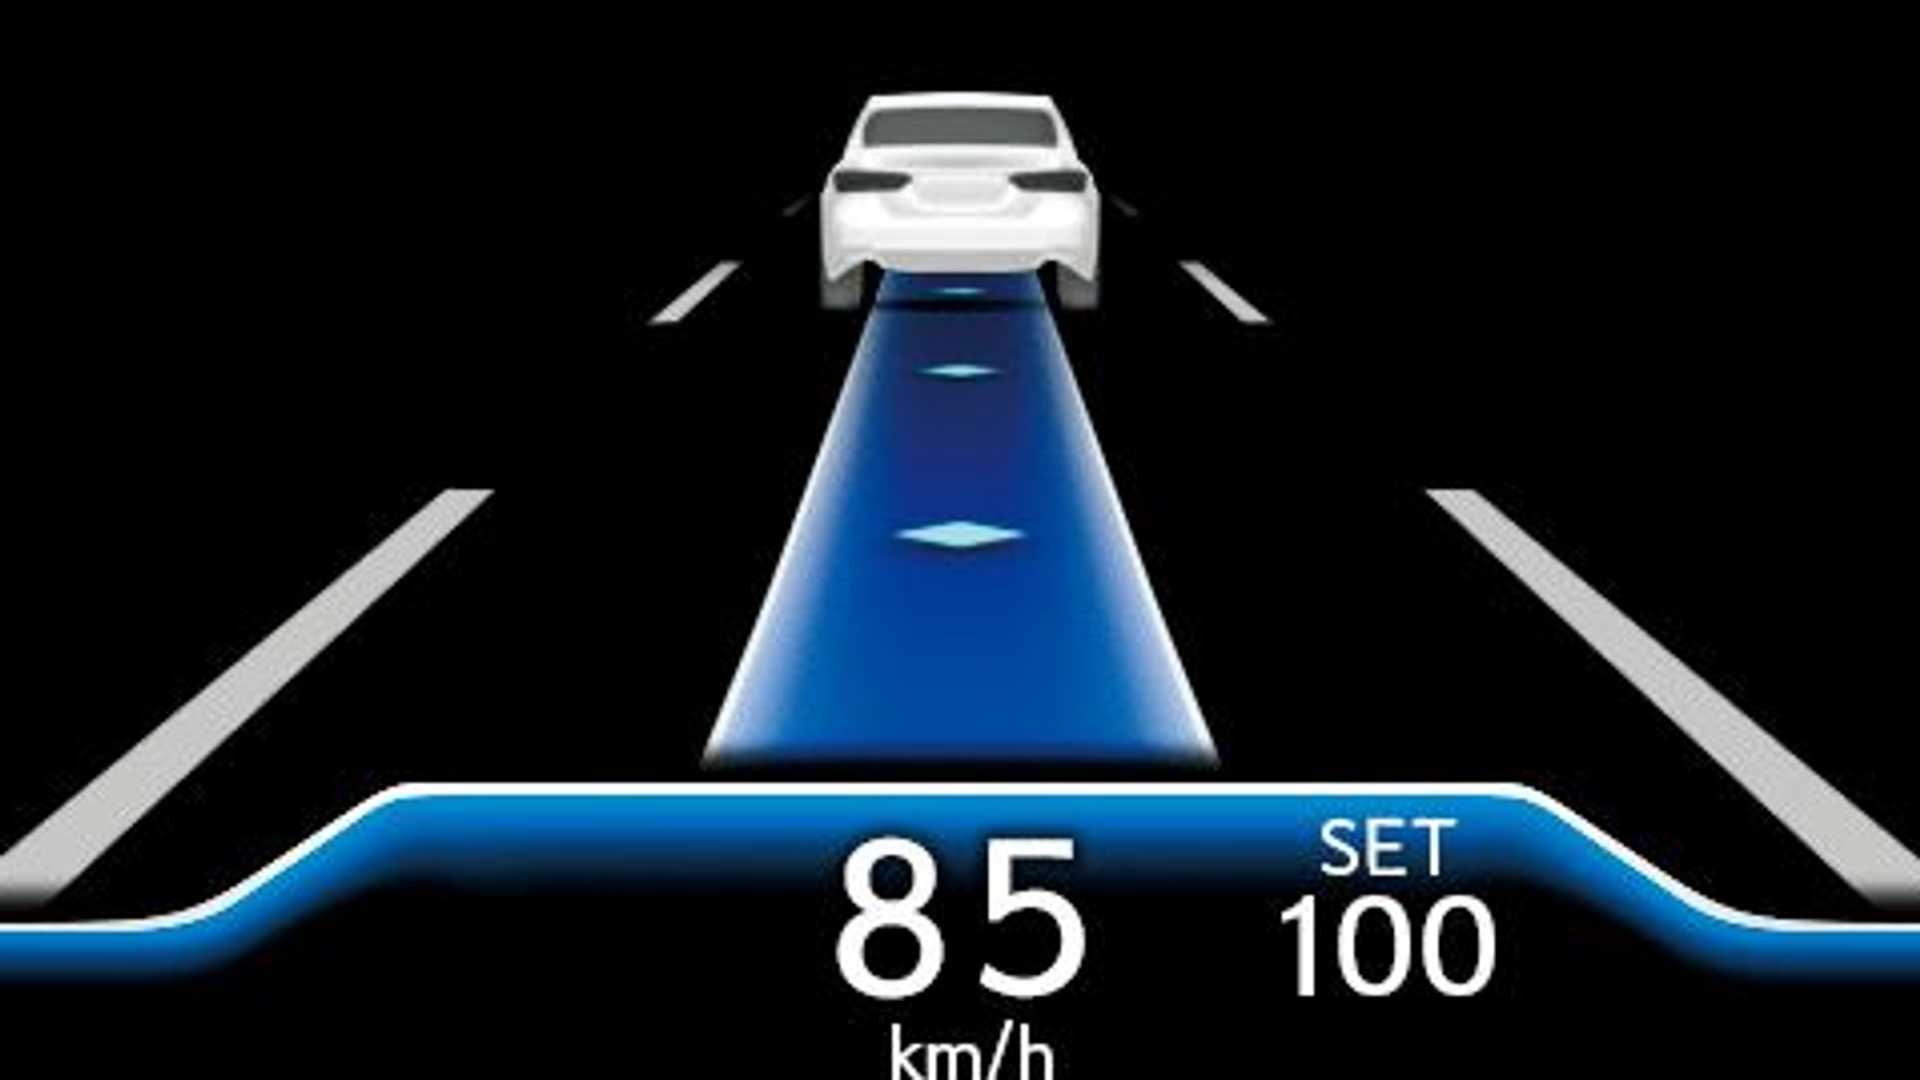 Lexus-LS-And-Toyota-Mirai-Advanced-Drive-14